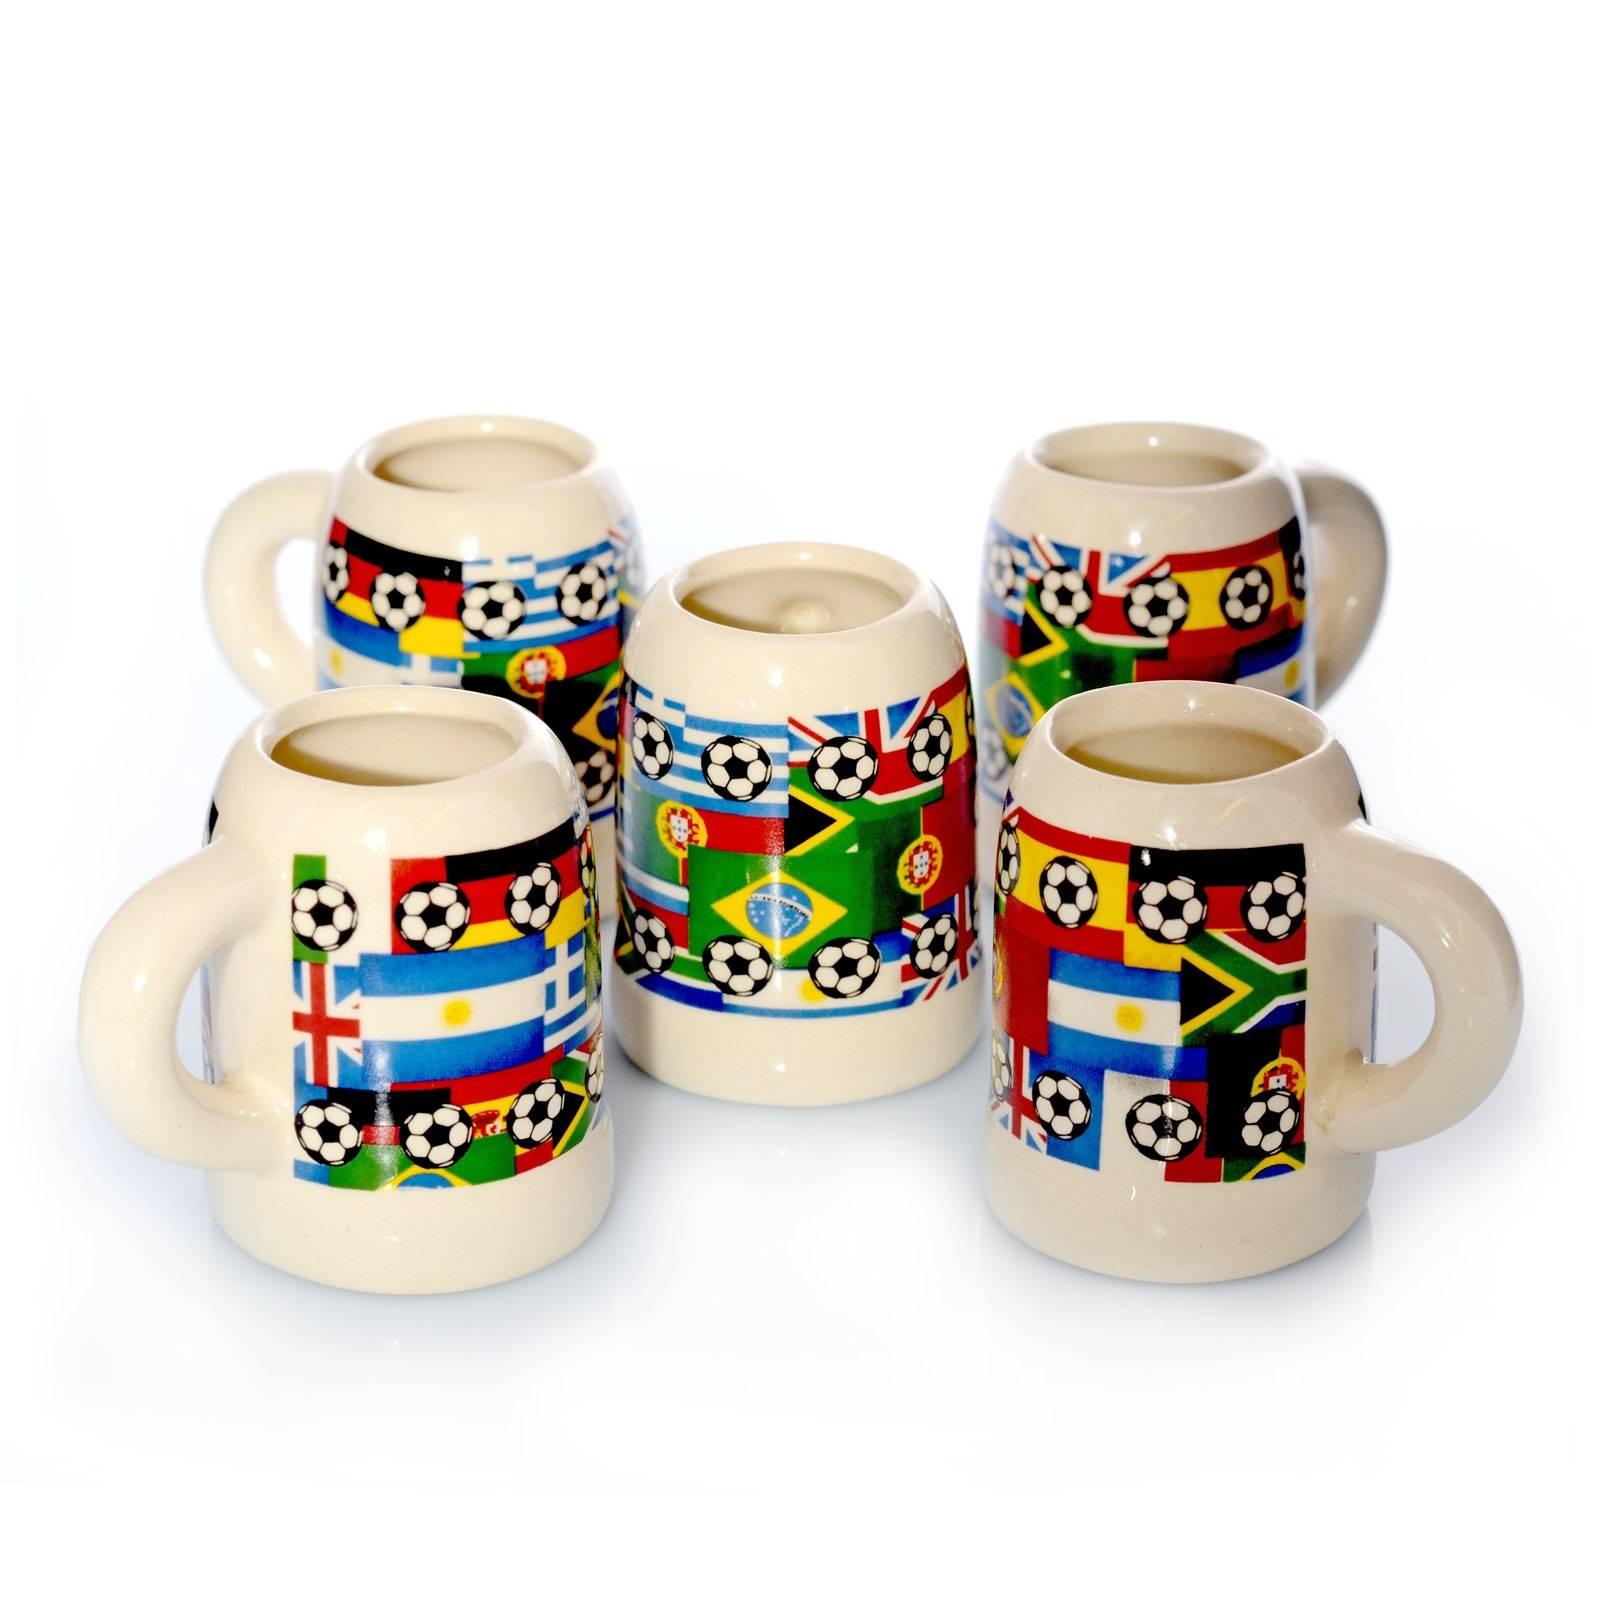 schnaps becher ma krug mit henkel keramik ca 4 cl. Black Bedroom Furniture Sets. Home Design Ideas